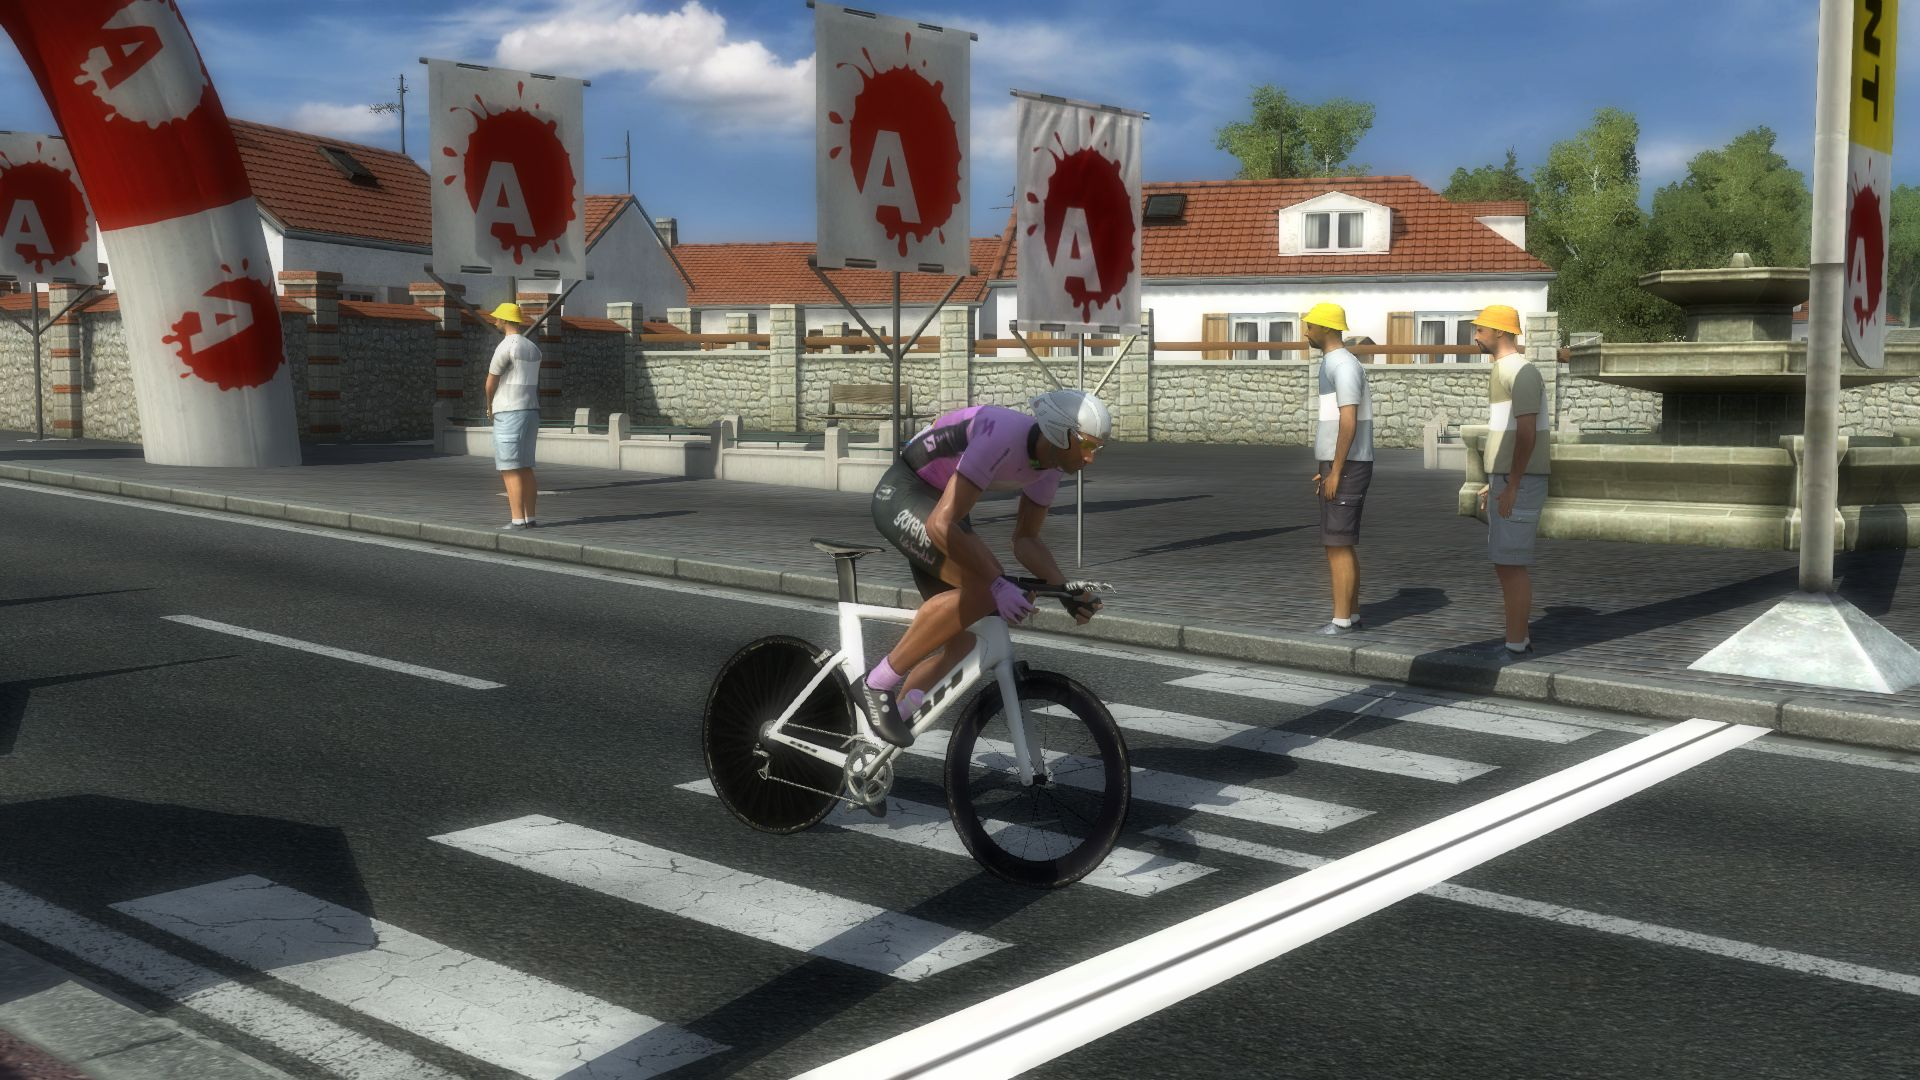 pcmdaily.com/images/mg/2019/Races/C1/Bayern/S4/mg19_bay_s04_22.jpg